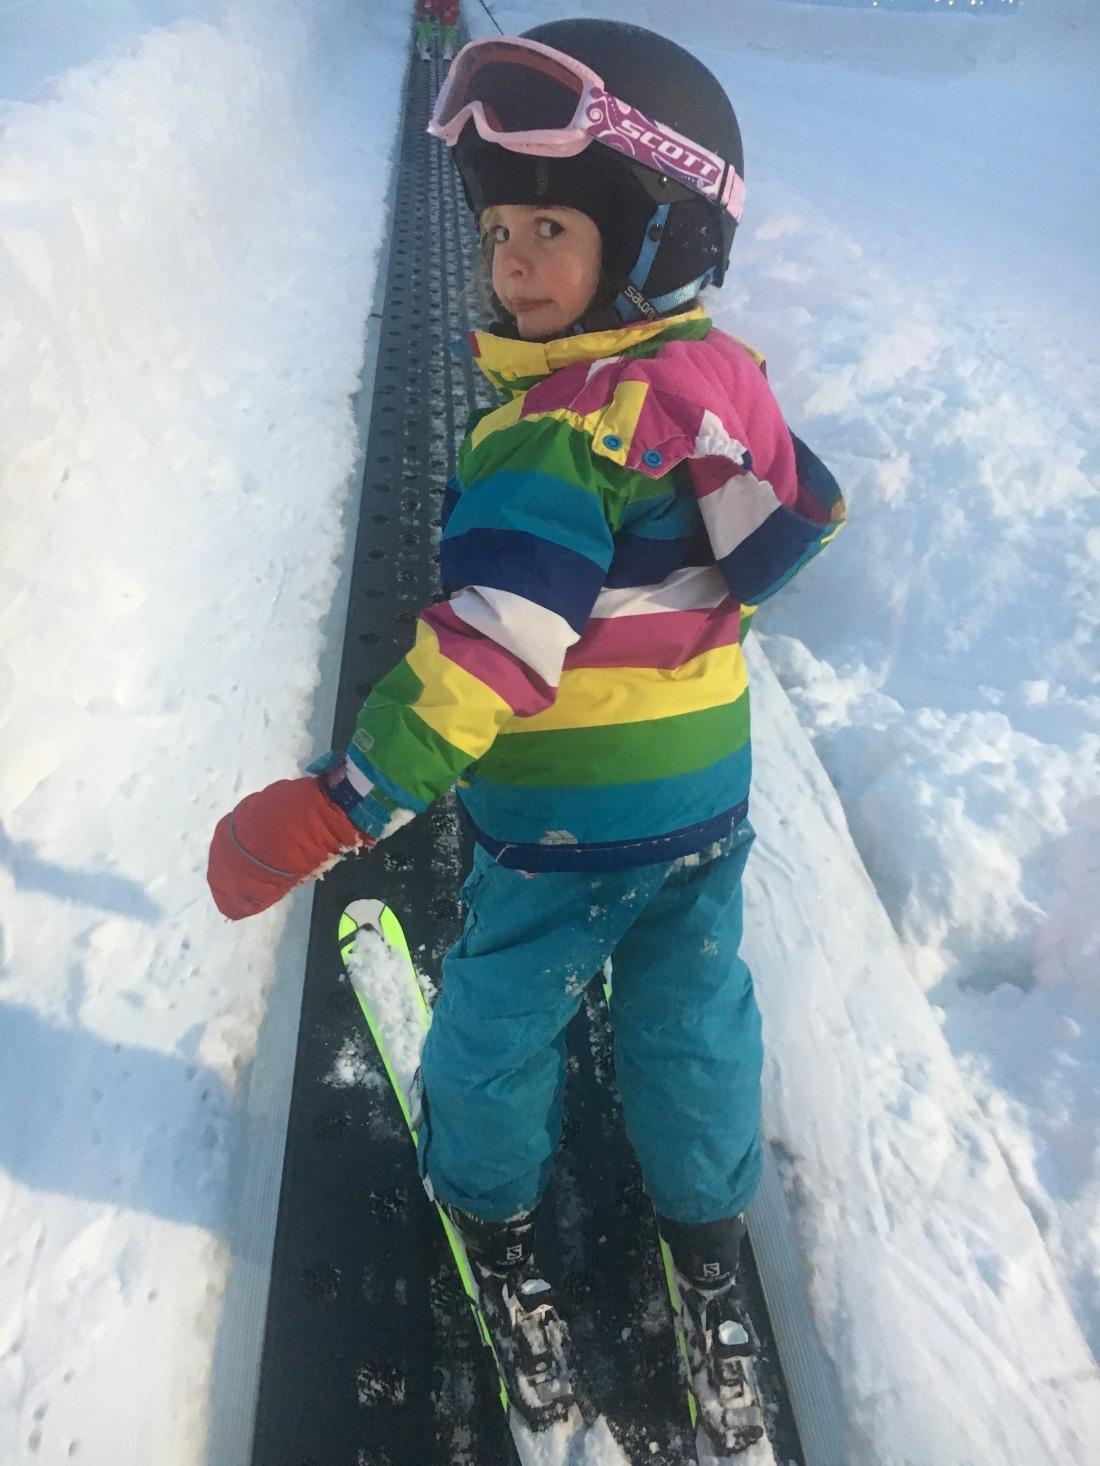 Ounasvaara Ski Resort: lapland